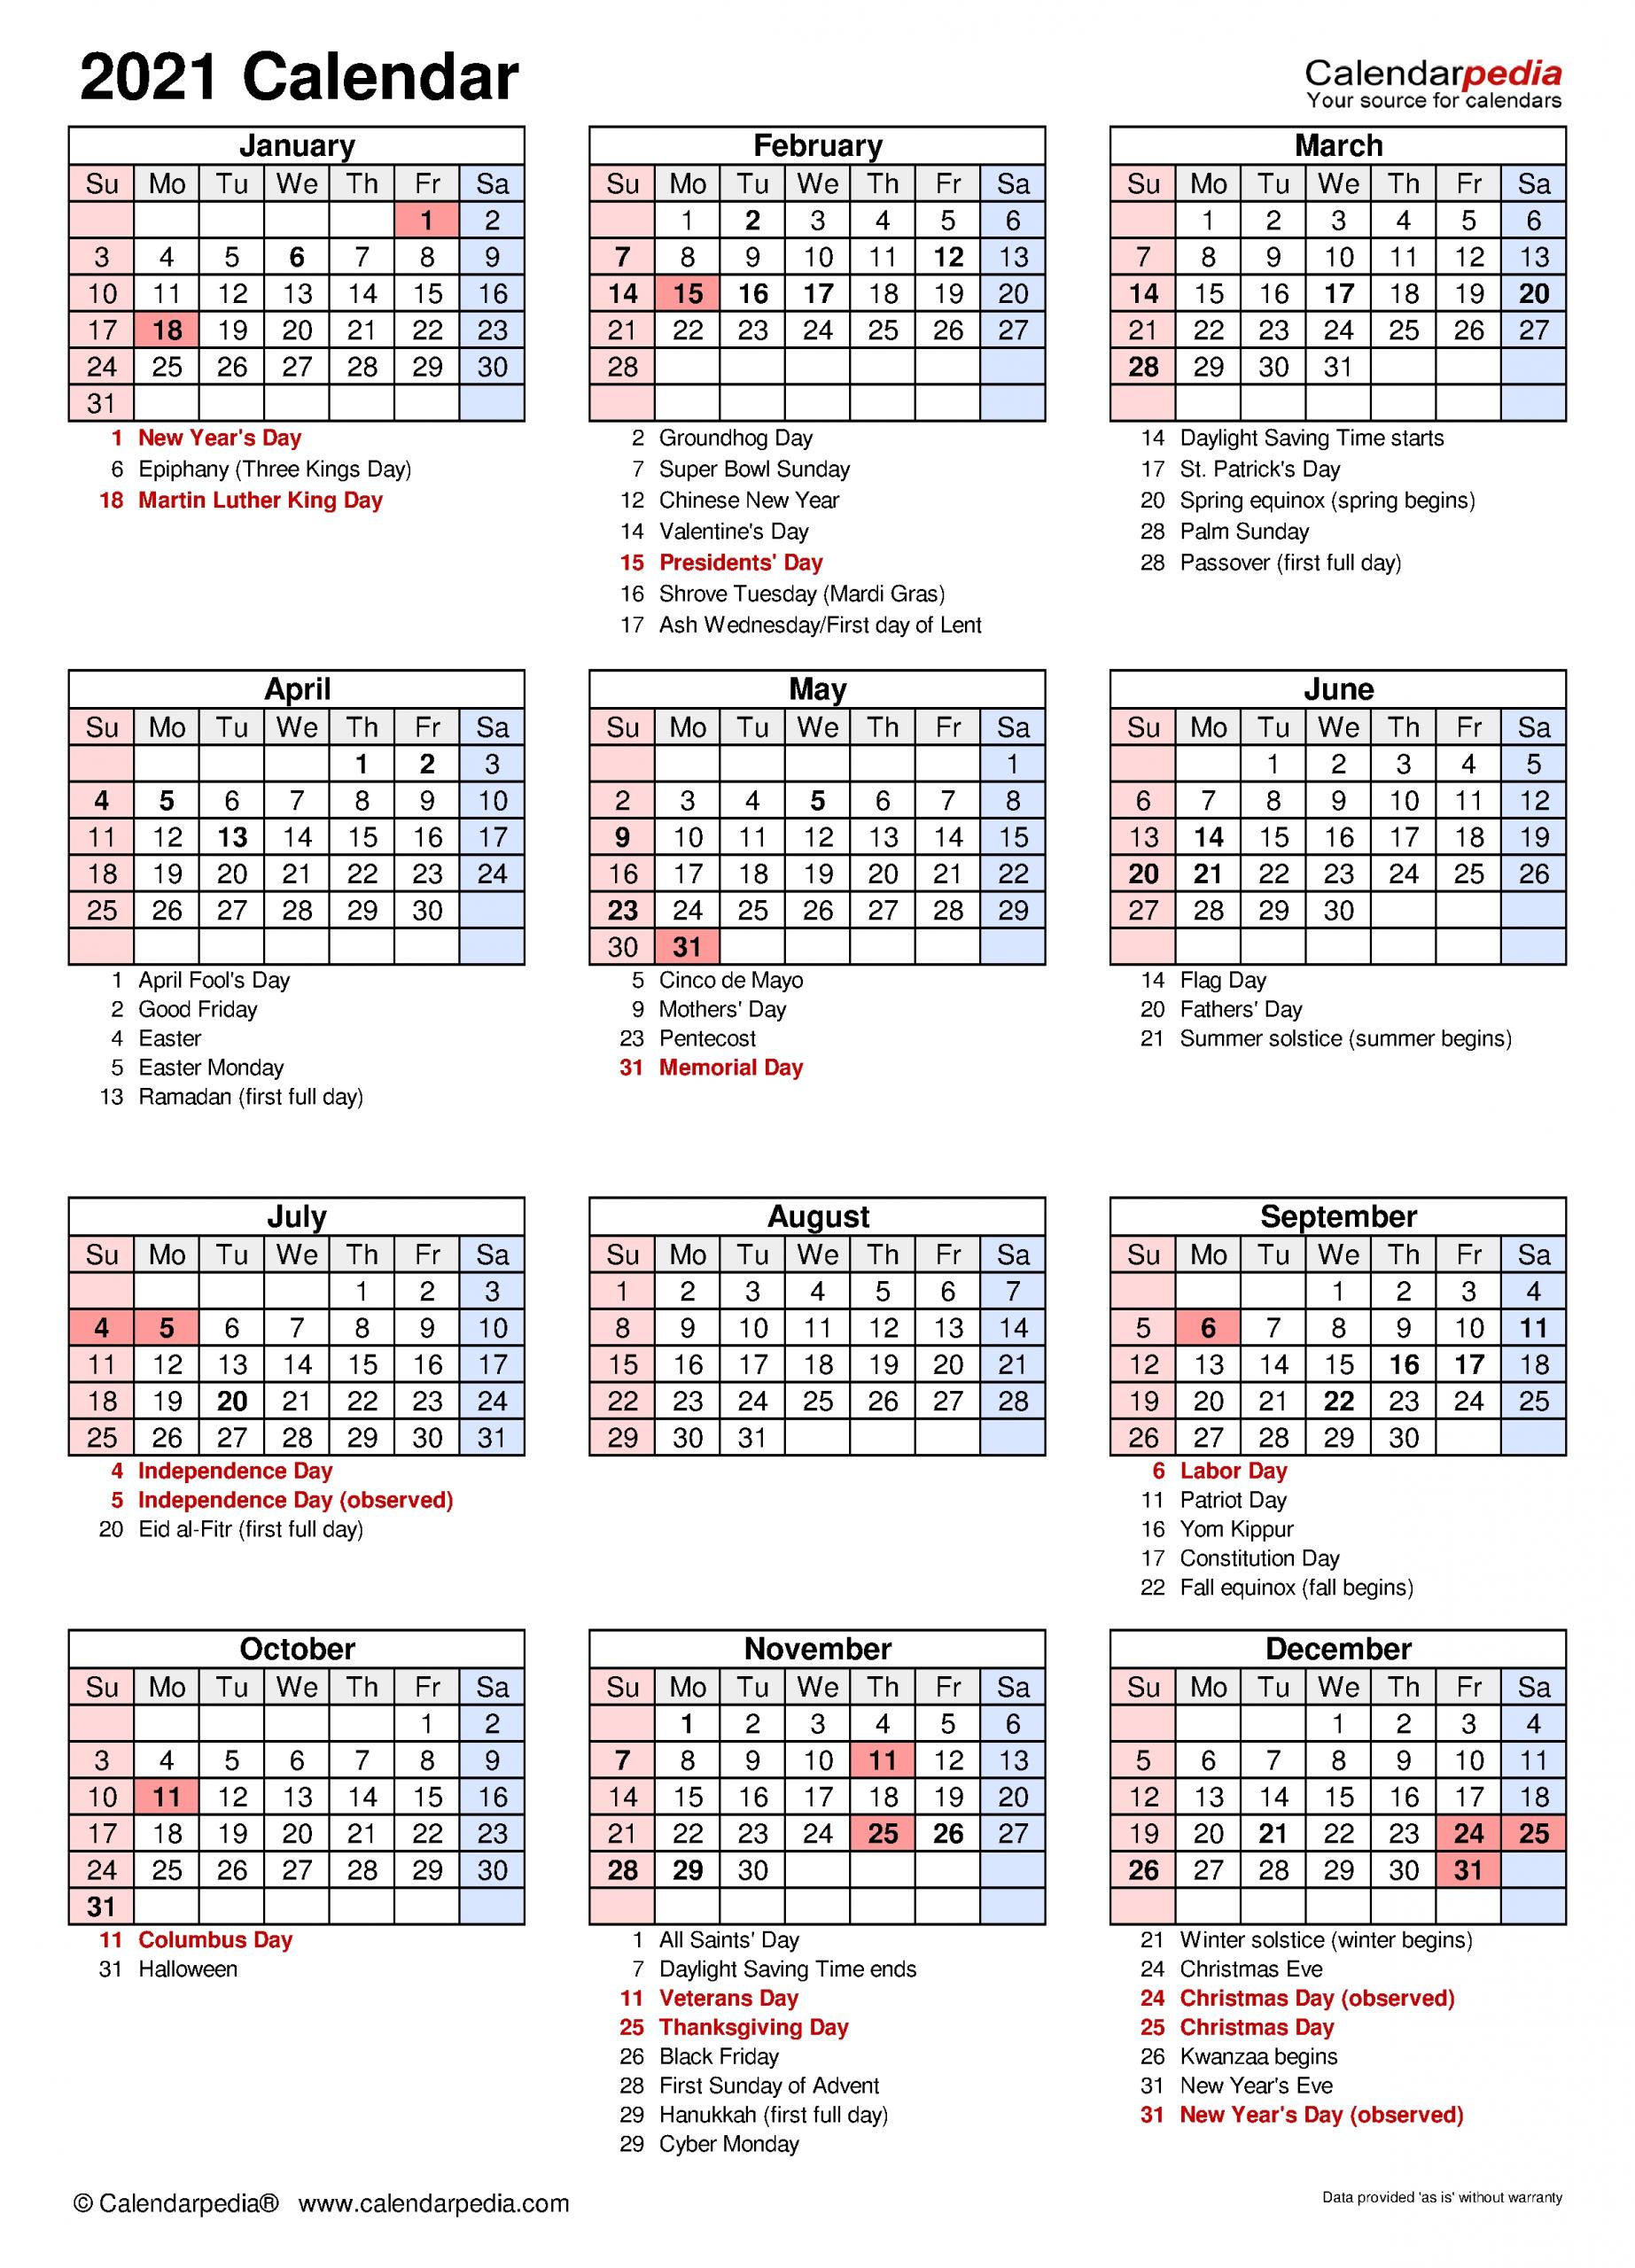 Passover 2021 Calendar | Printable Calendars 2021 within Downloadable 2021 2021 Academic Calendar Photo